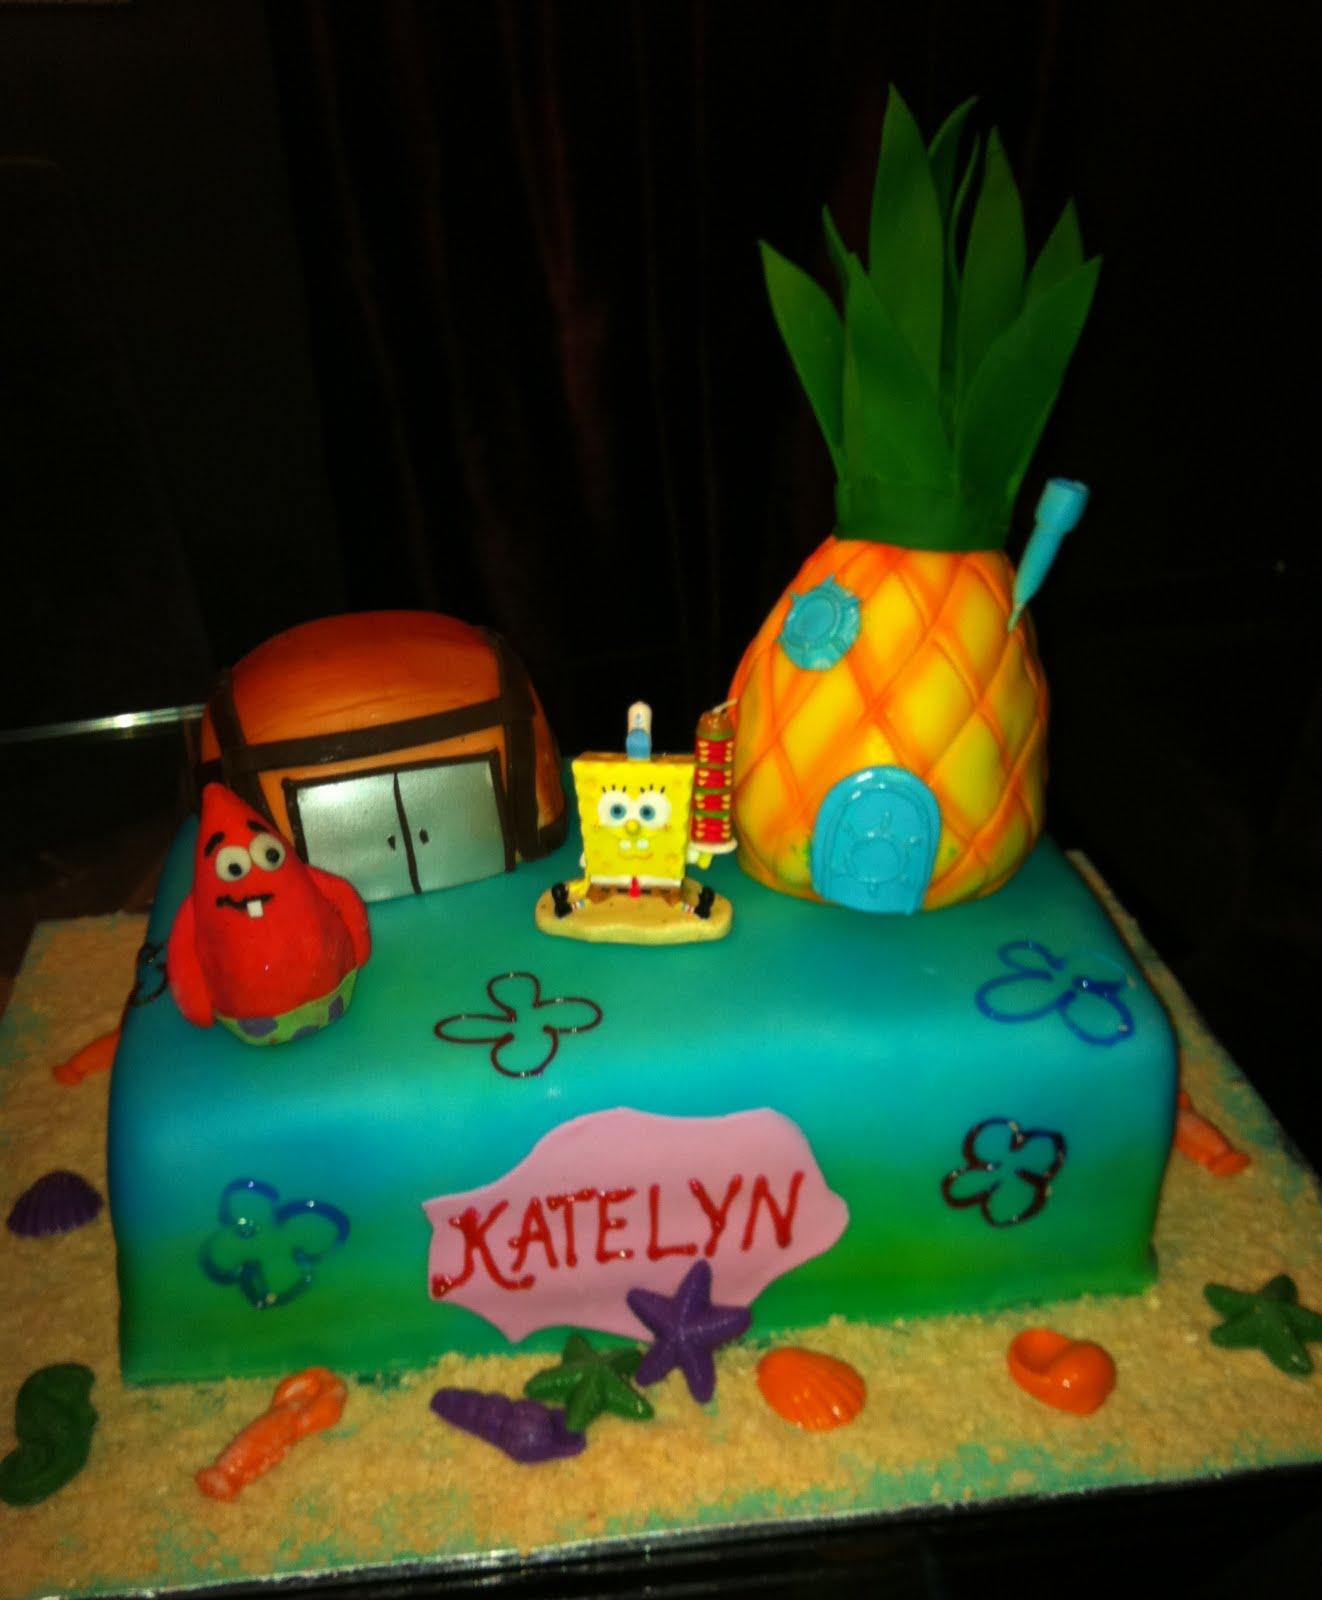 Jocelyns Wedding Cakes and More Sponge Bob and Patrick Star